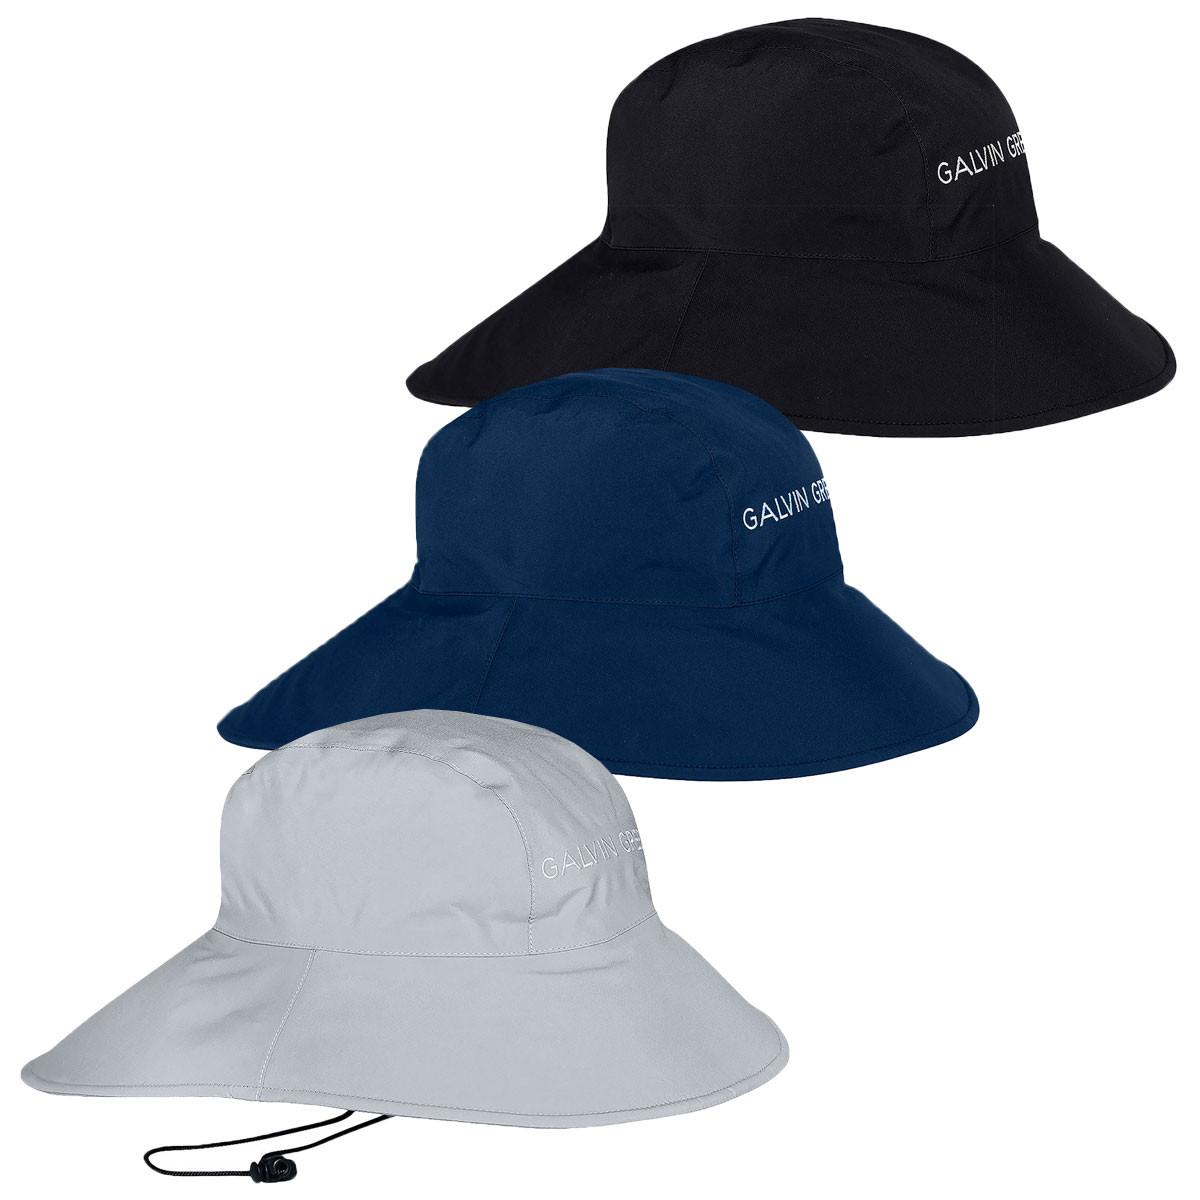 4ea5ee794426b Galvin Green Mens SS19 Waterproof Aqua Gore-Tex Golf Bucket Hat ...